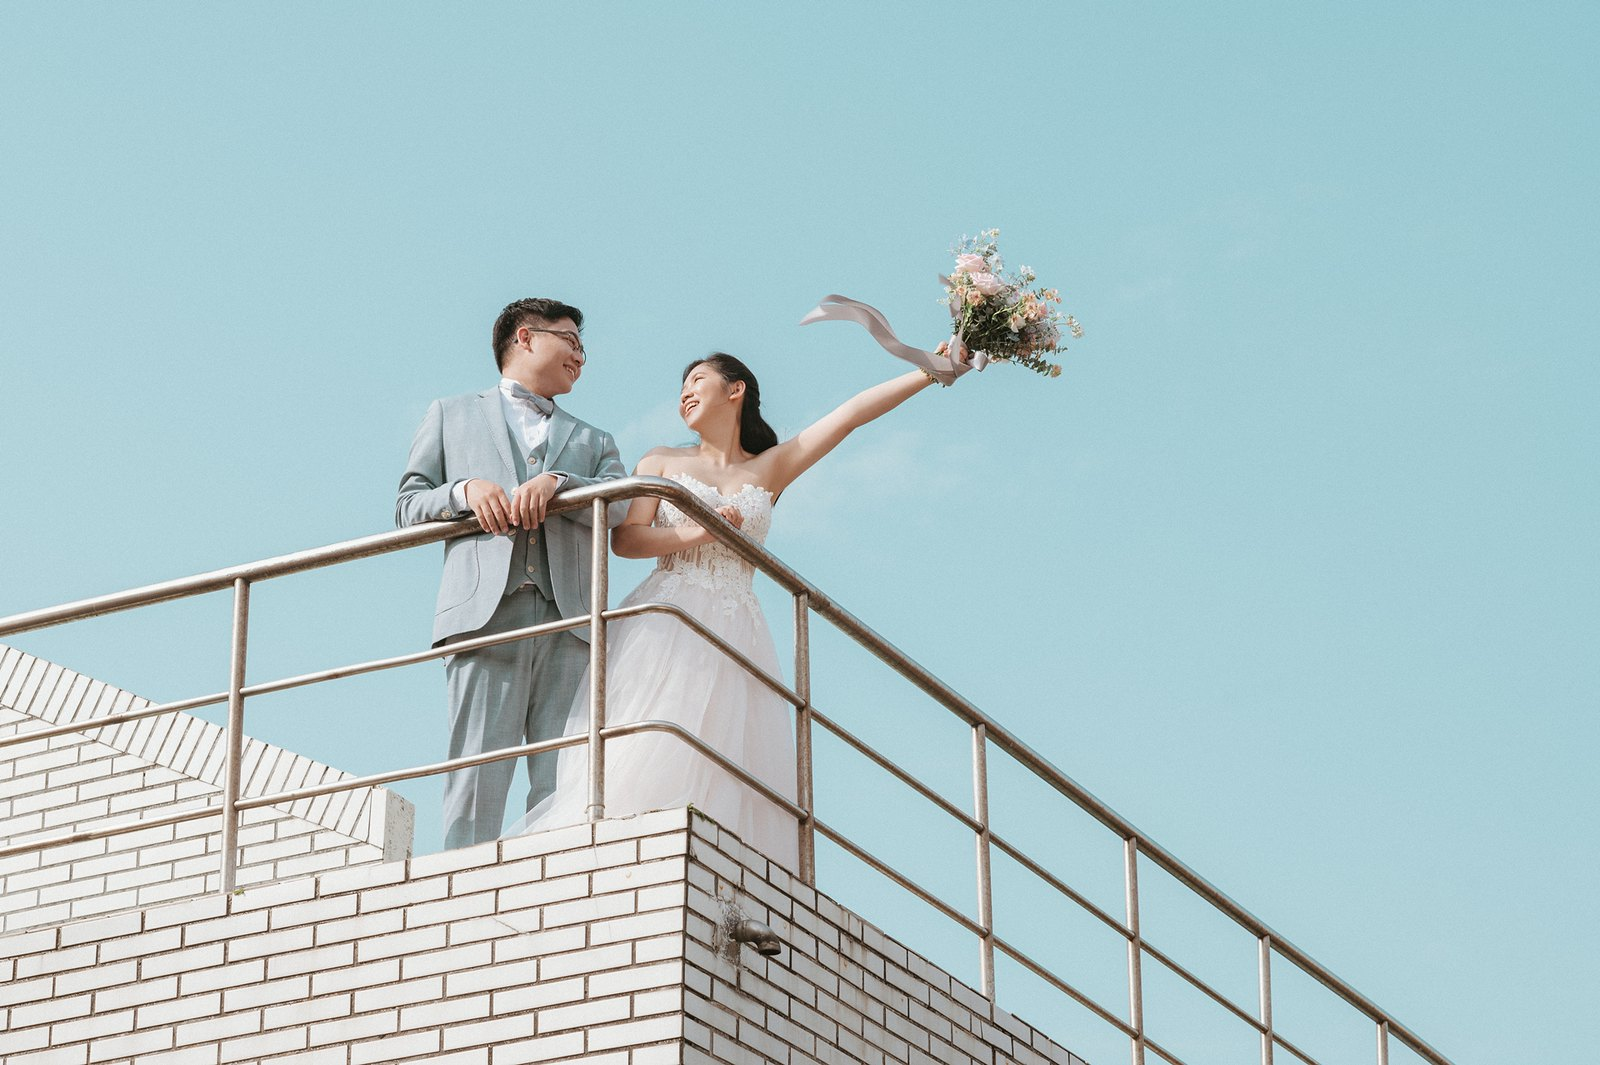 【婚紗】Eric & Ruby / 長庚大學 / EASTERN WEDDING studio